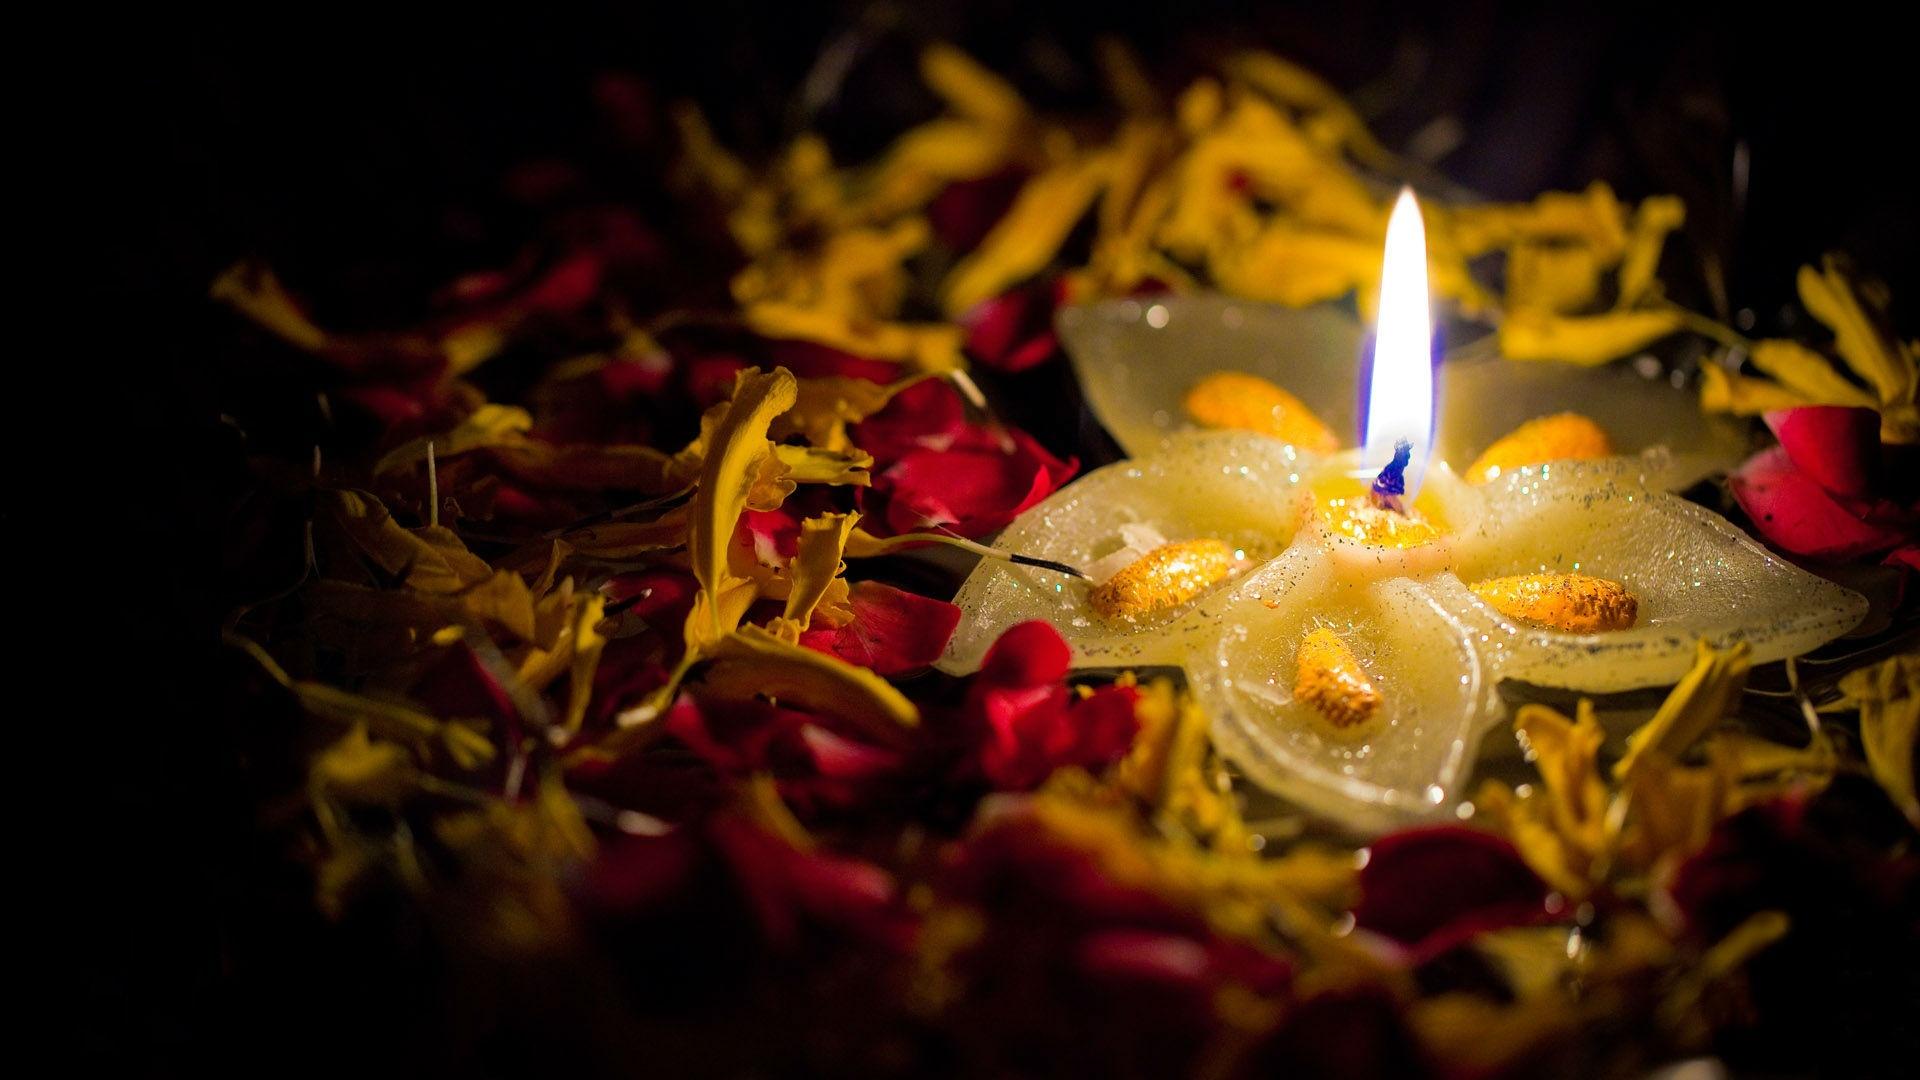 28 Amazing Diwali Wallpaper Hd